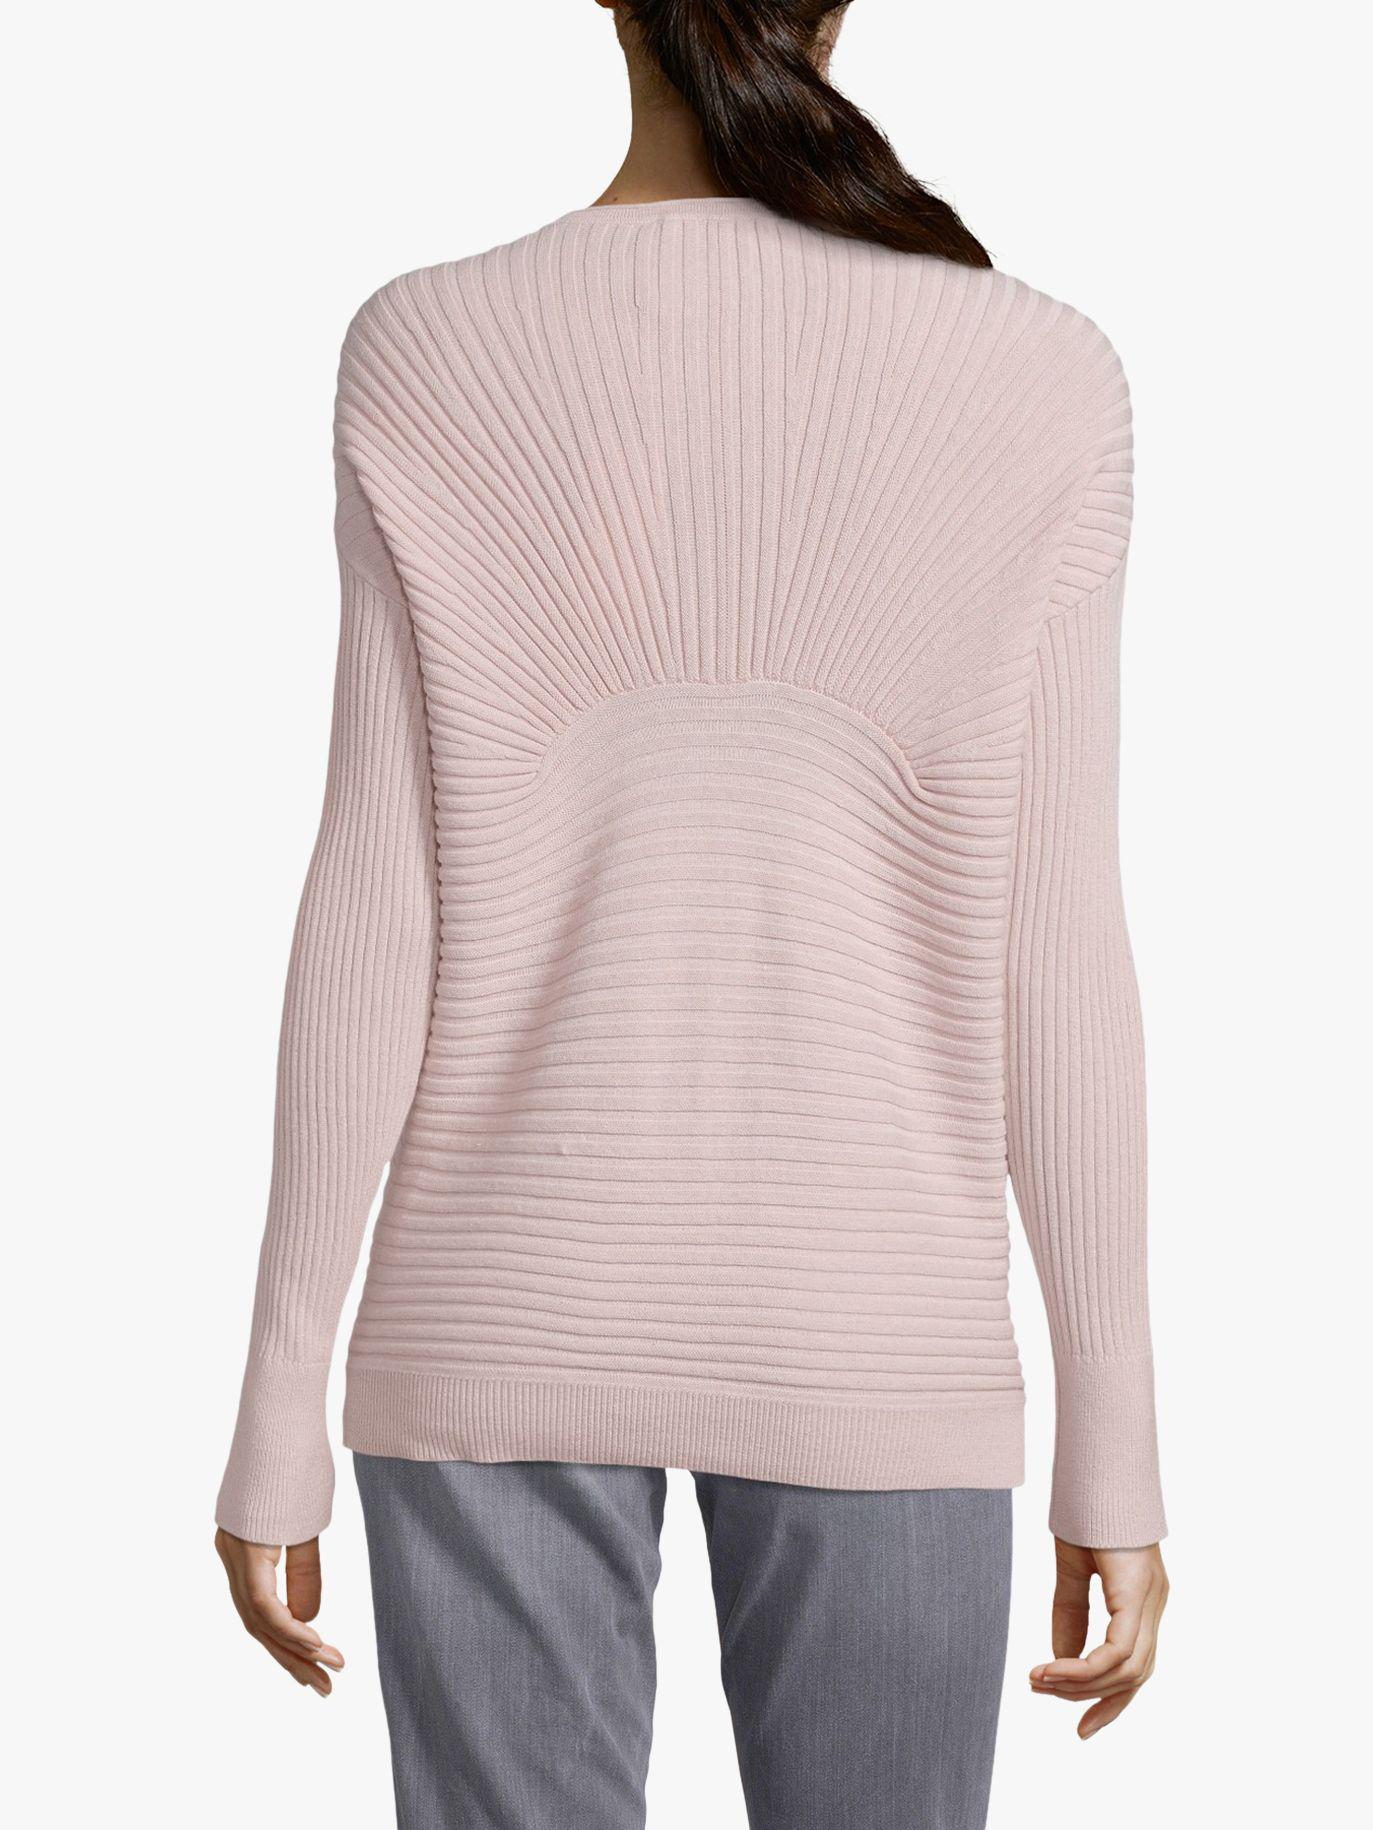 Betty Barclay - Pink Multi Texture Ribbed Knit Jumper - Lyst. View  fullscreen f82450123